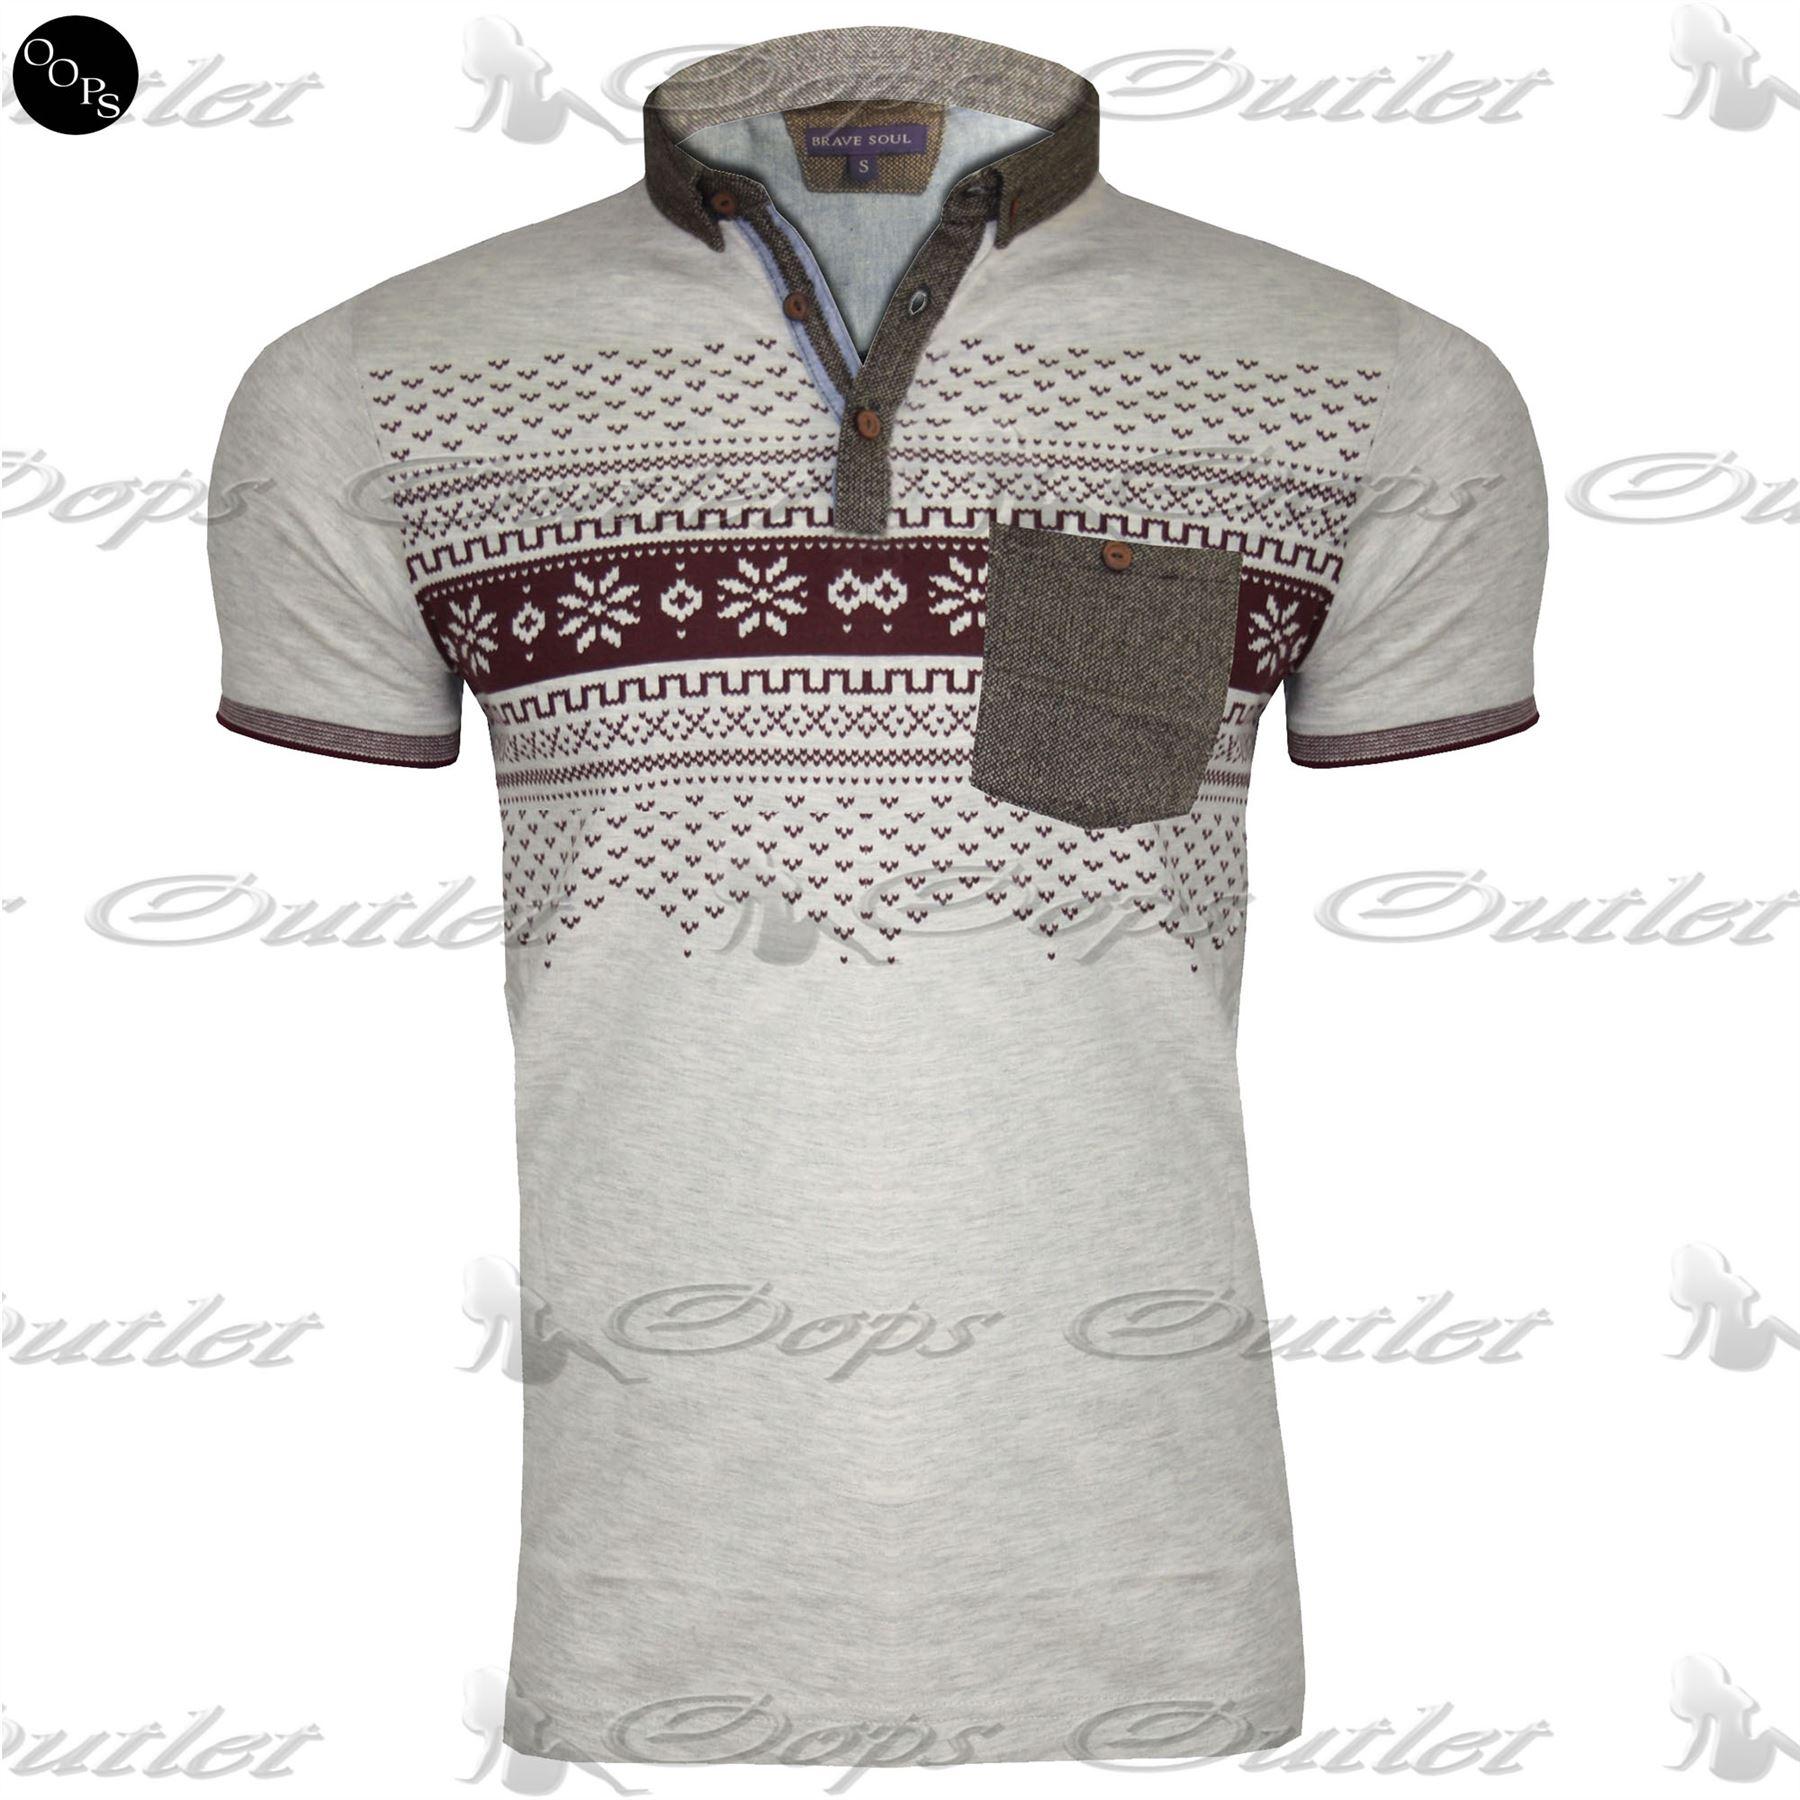 Polo Pocket T Shirts